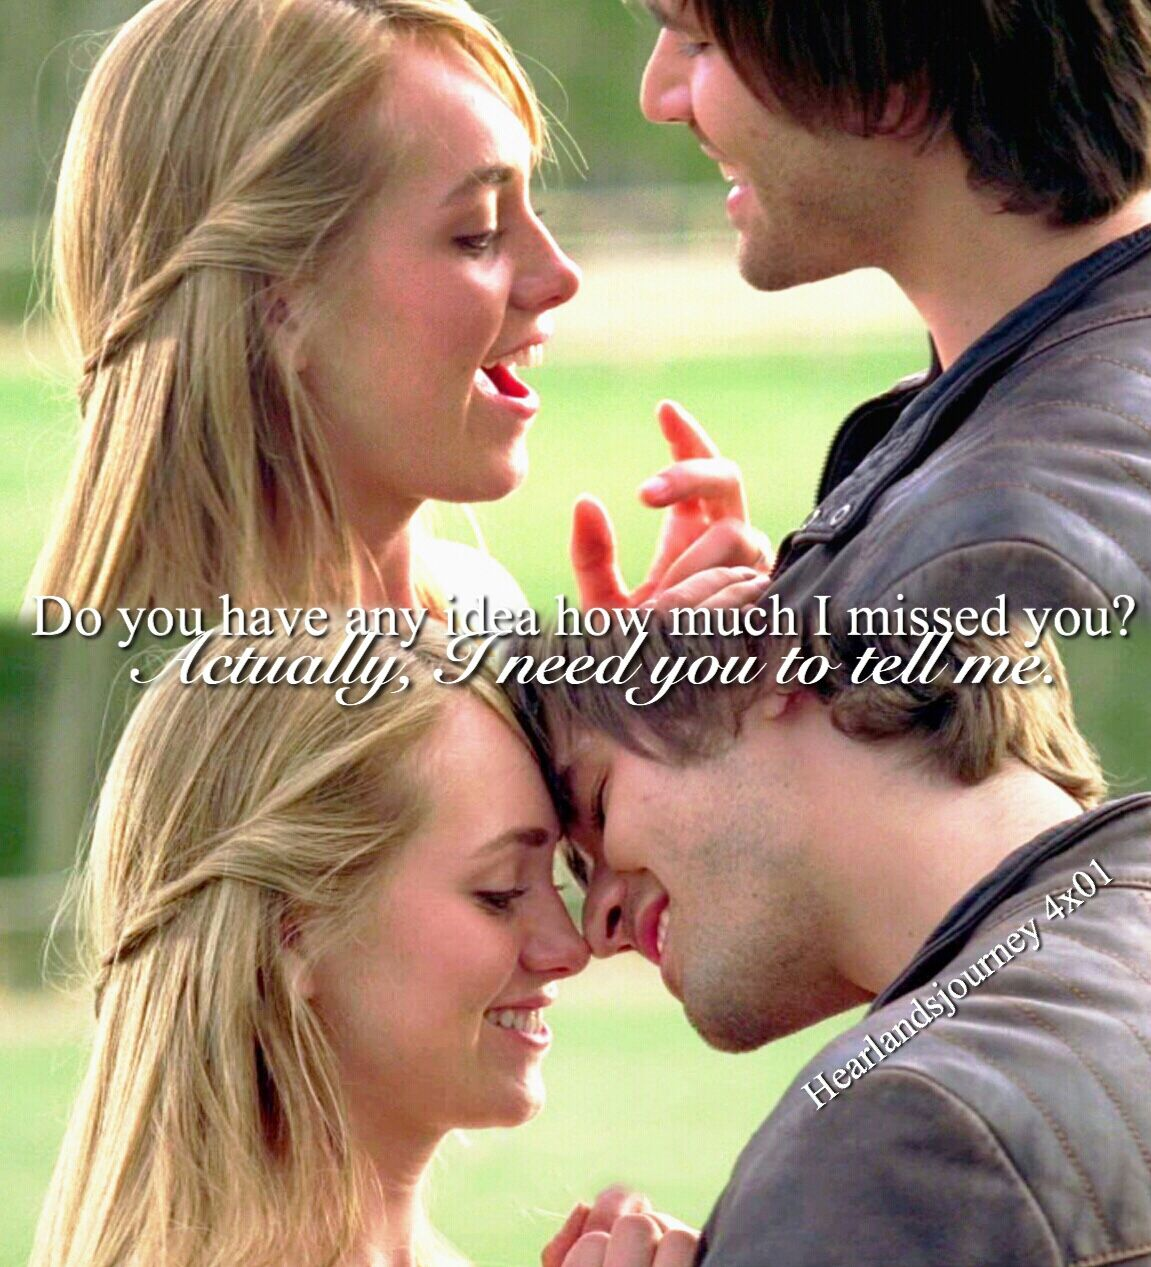 Do You Have Any Idea How Much I Missed You Amy Ty Season 4 Episode 01 Heartland Ty Heartland Heartland Amy